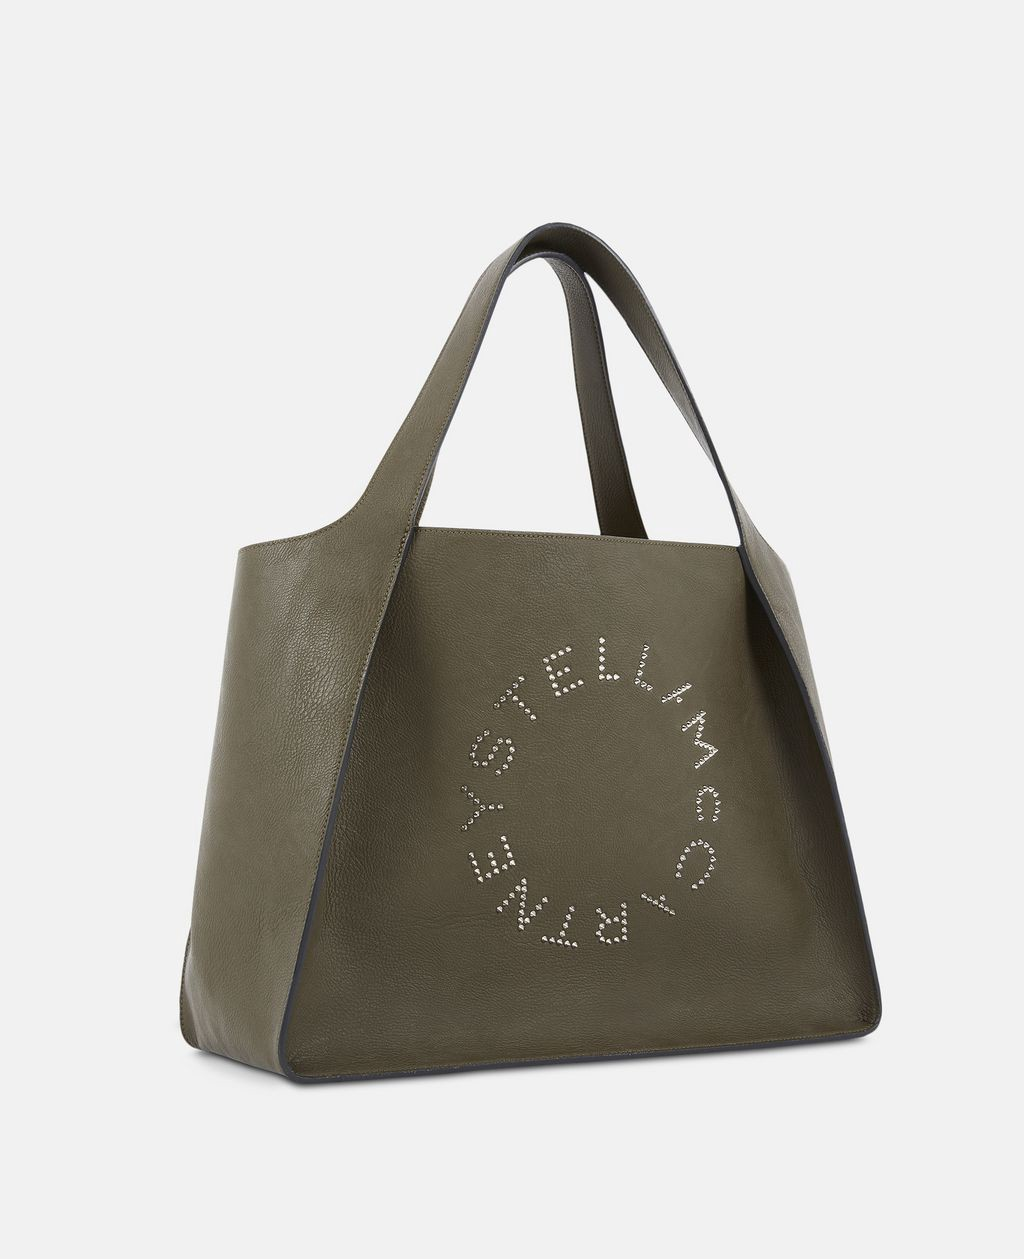 Stella Mccartney Studded Logo Tote Bag - Green Onesize  589d8294d61d3